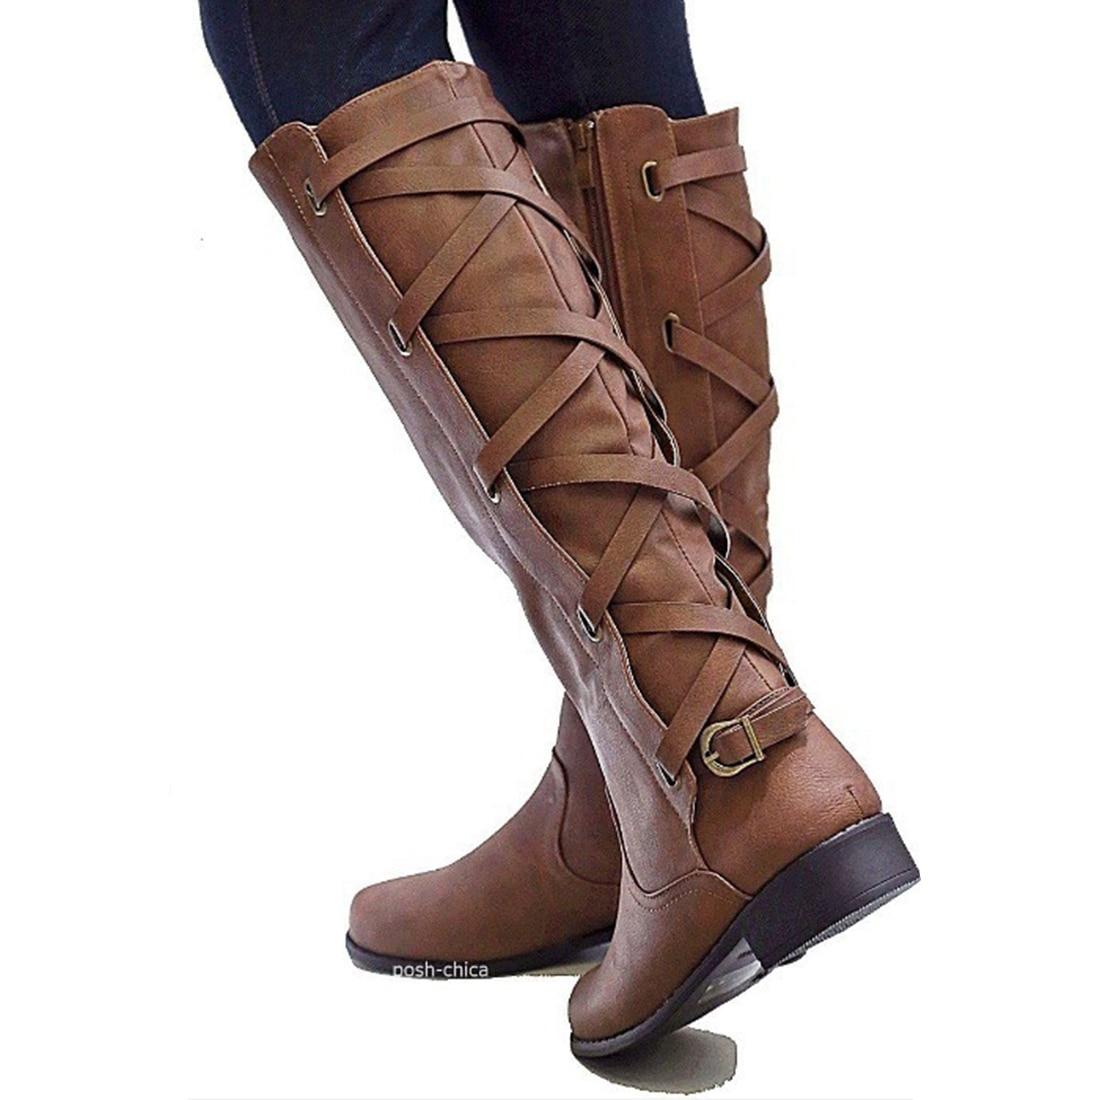 81d32aef4eaa Big Size 35-43 Knee High Women Boots Zipper Motorcycle Boots Low Heels  Buckle Cross Tie Platform Shoes Winter Riding Boots